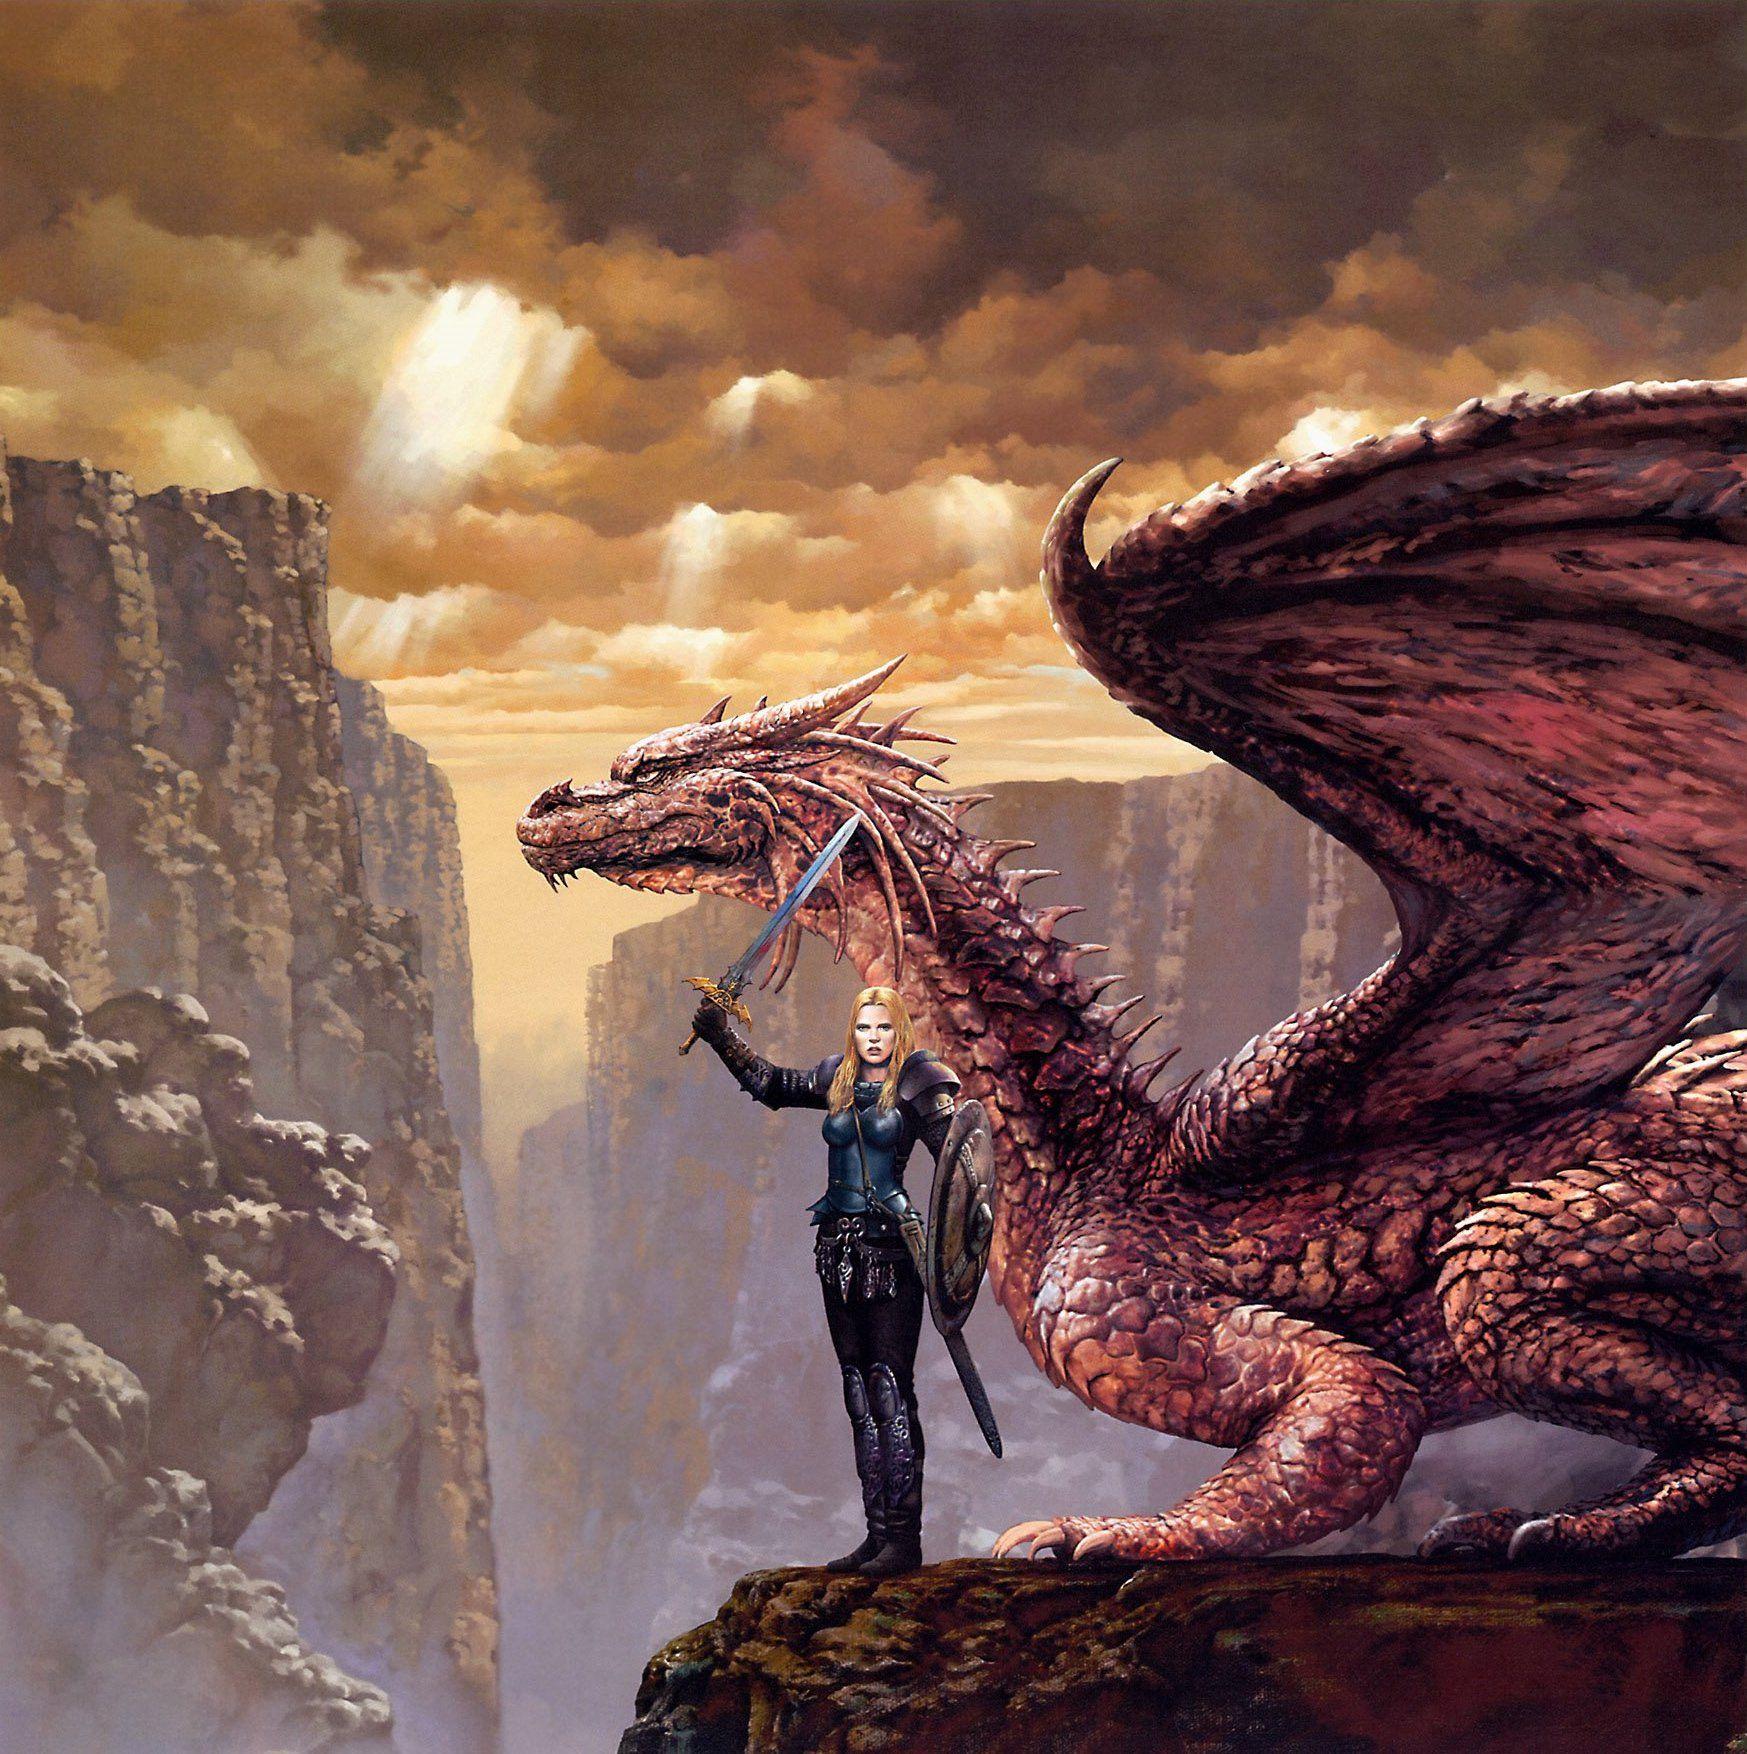 ciruelo cabral - xadel the dragon rider